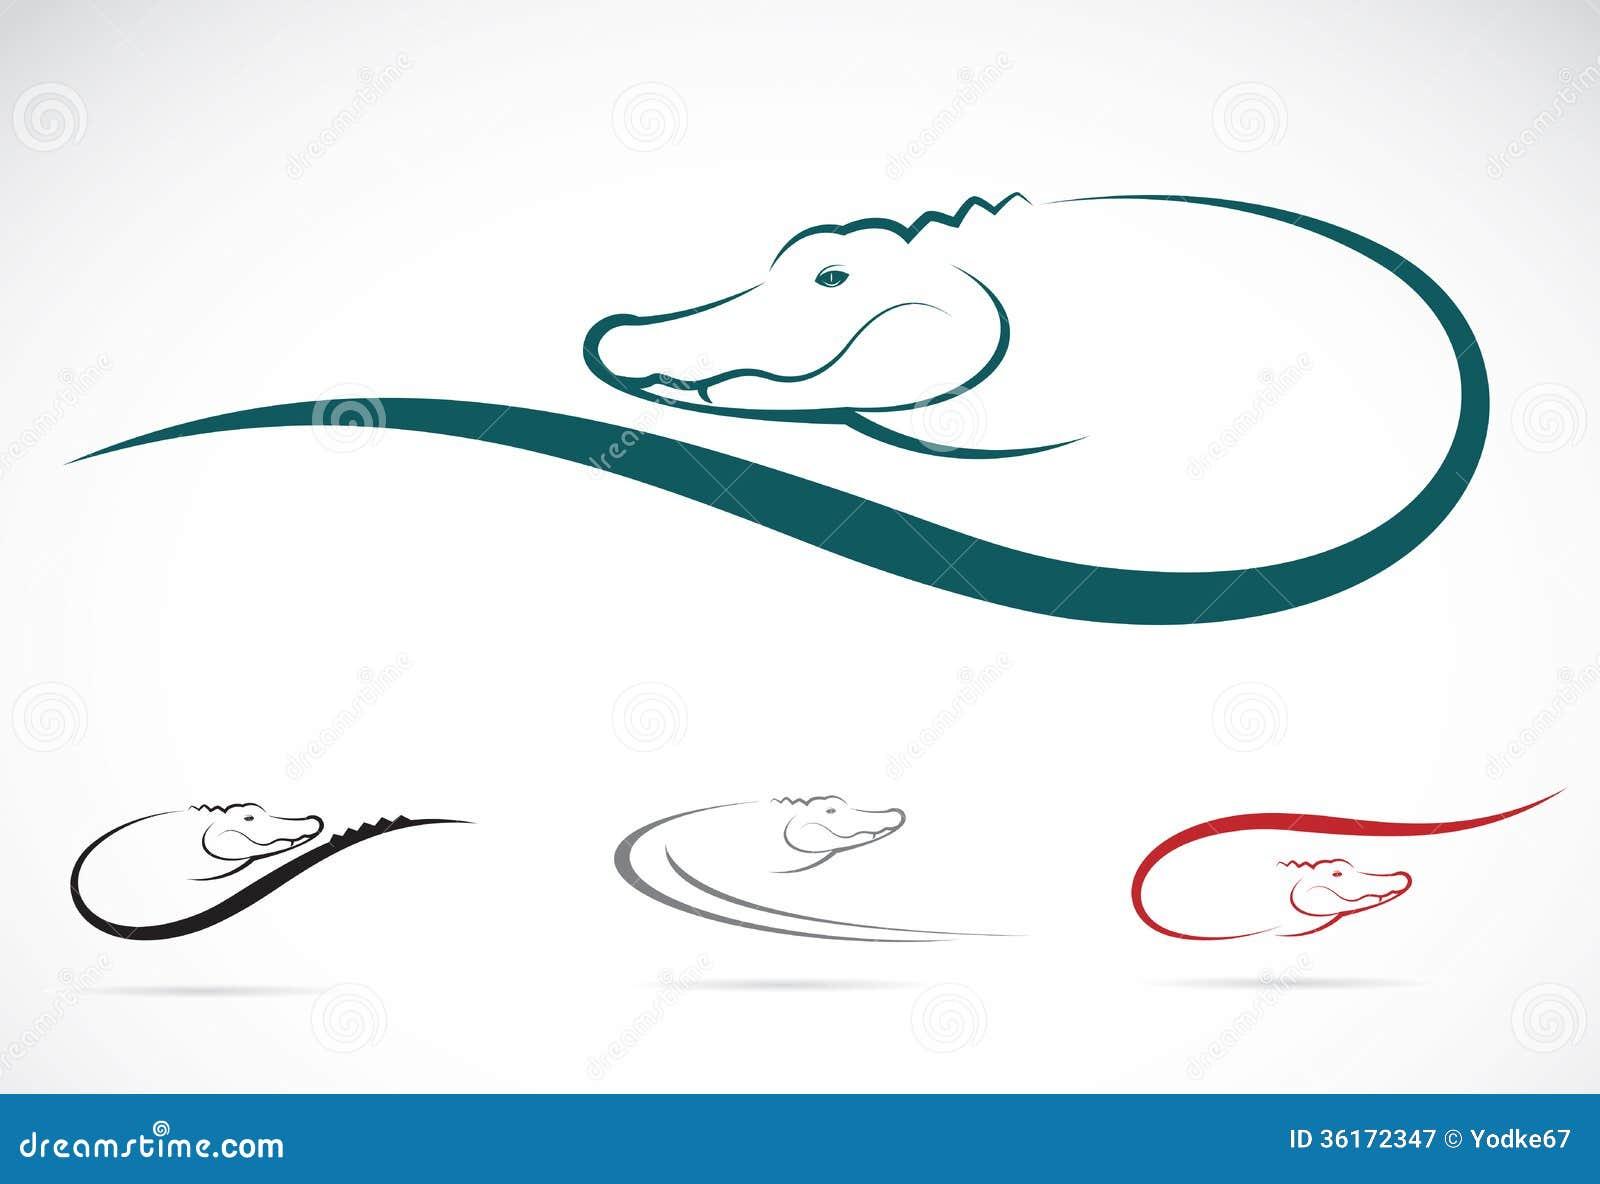 Vector Image Of An Crocodile Stock Vector